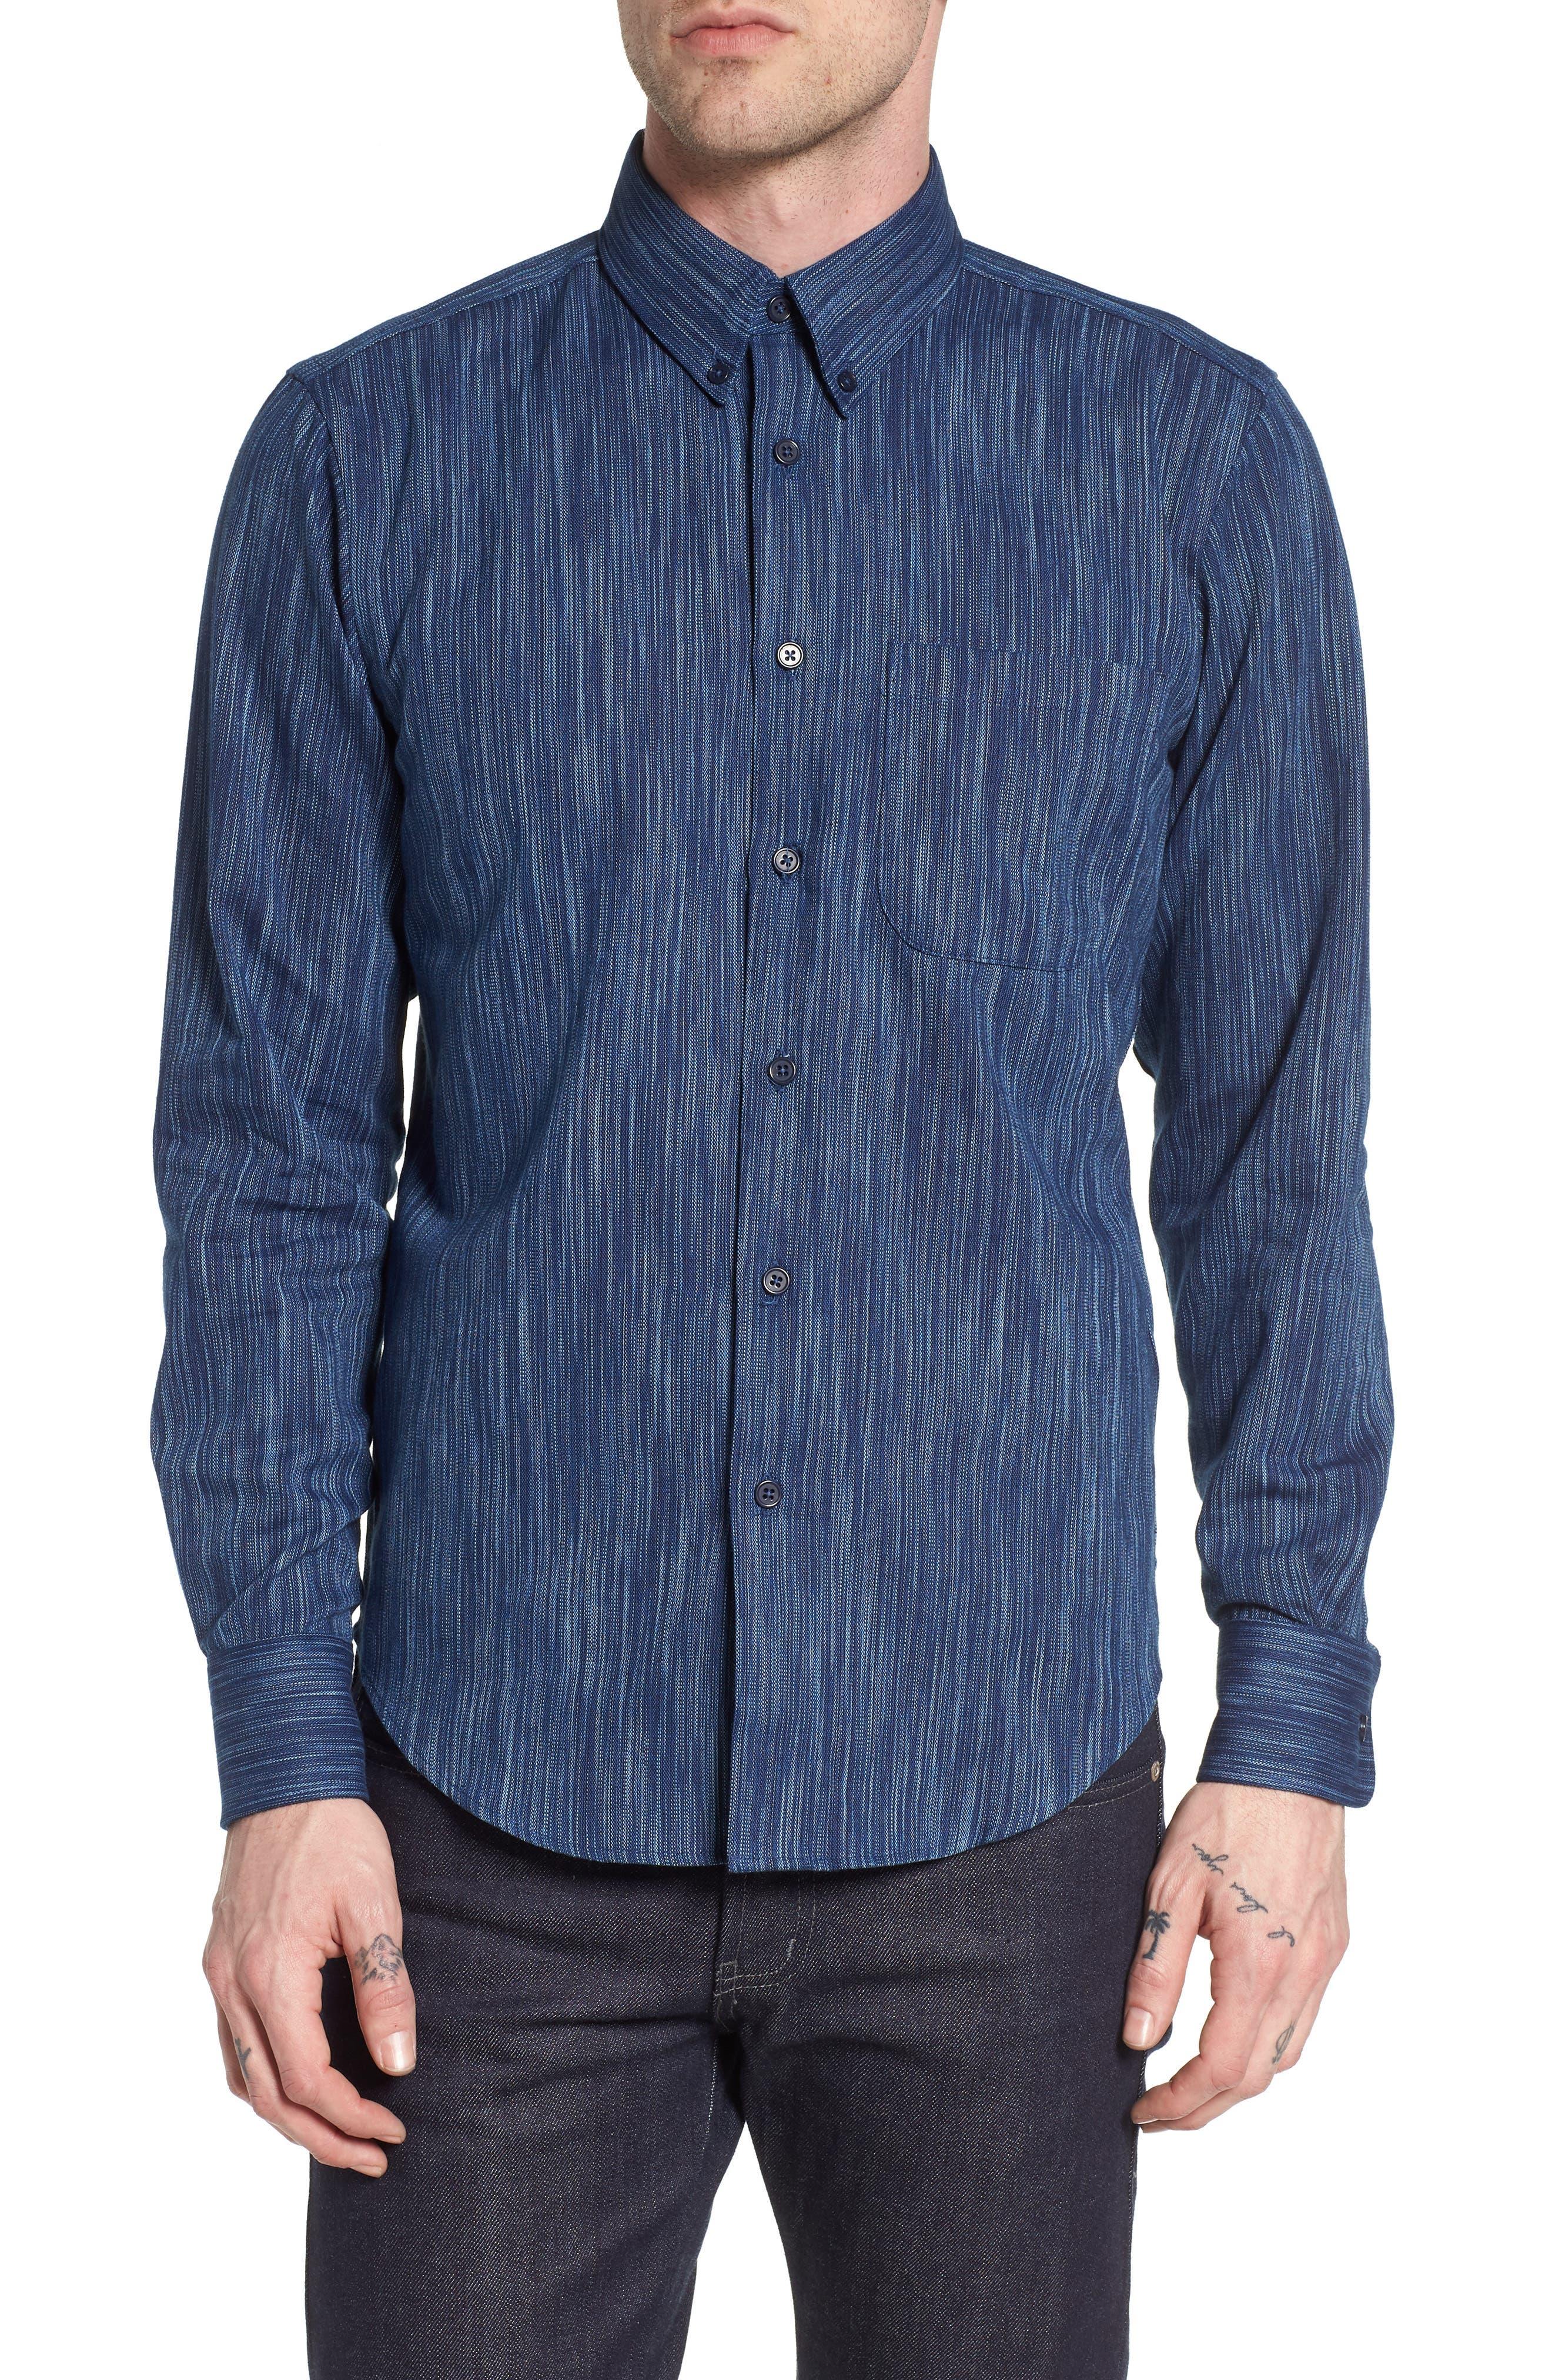 Indigo Tie Dye Rain Weave Shirt,                             Main thumbnail 1, color,                             Blue